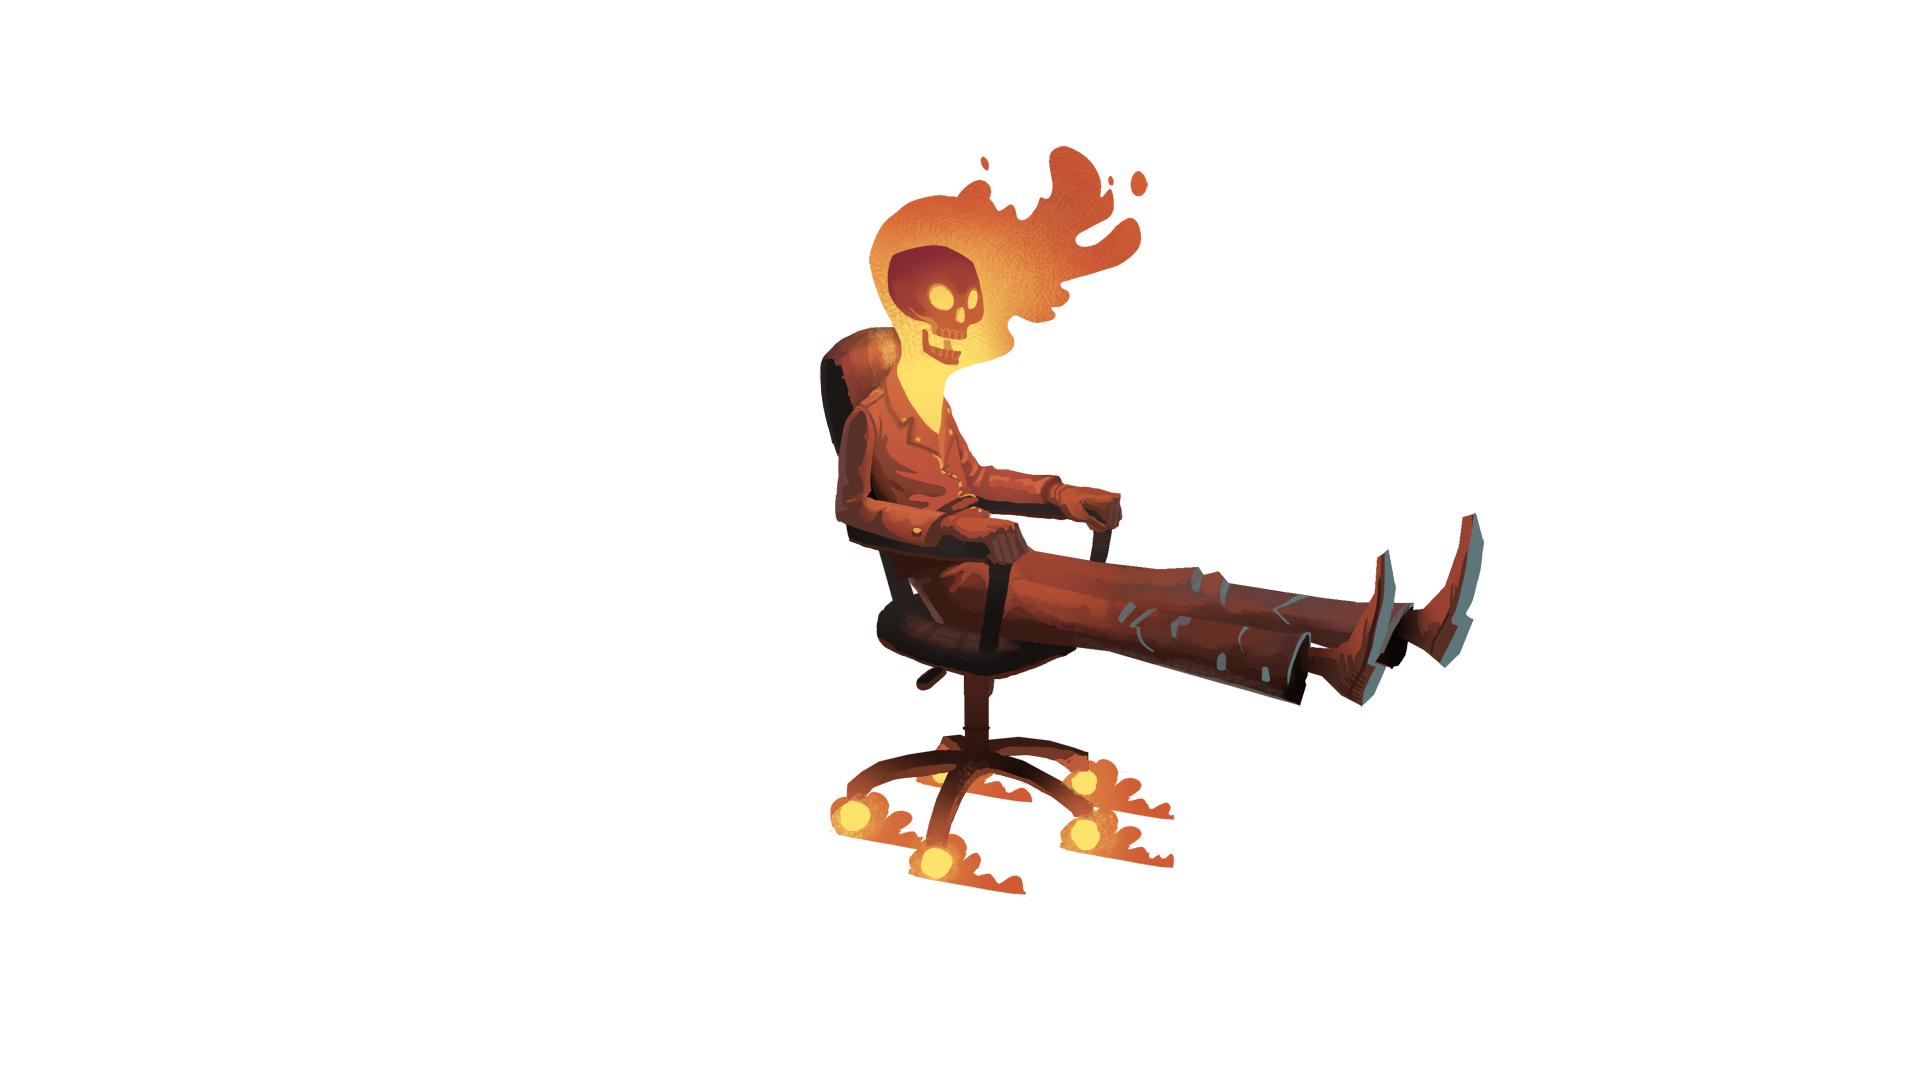 wheelchair on fire chair sashes for weddings ghost rider marvel skull white hd wallpaper